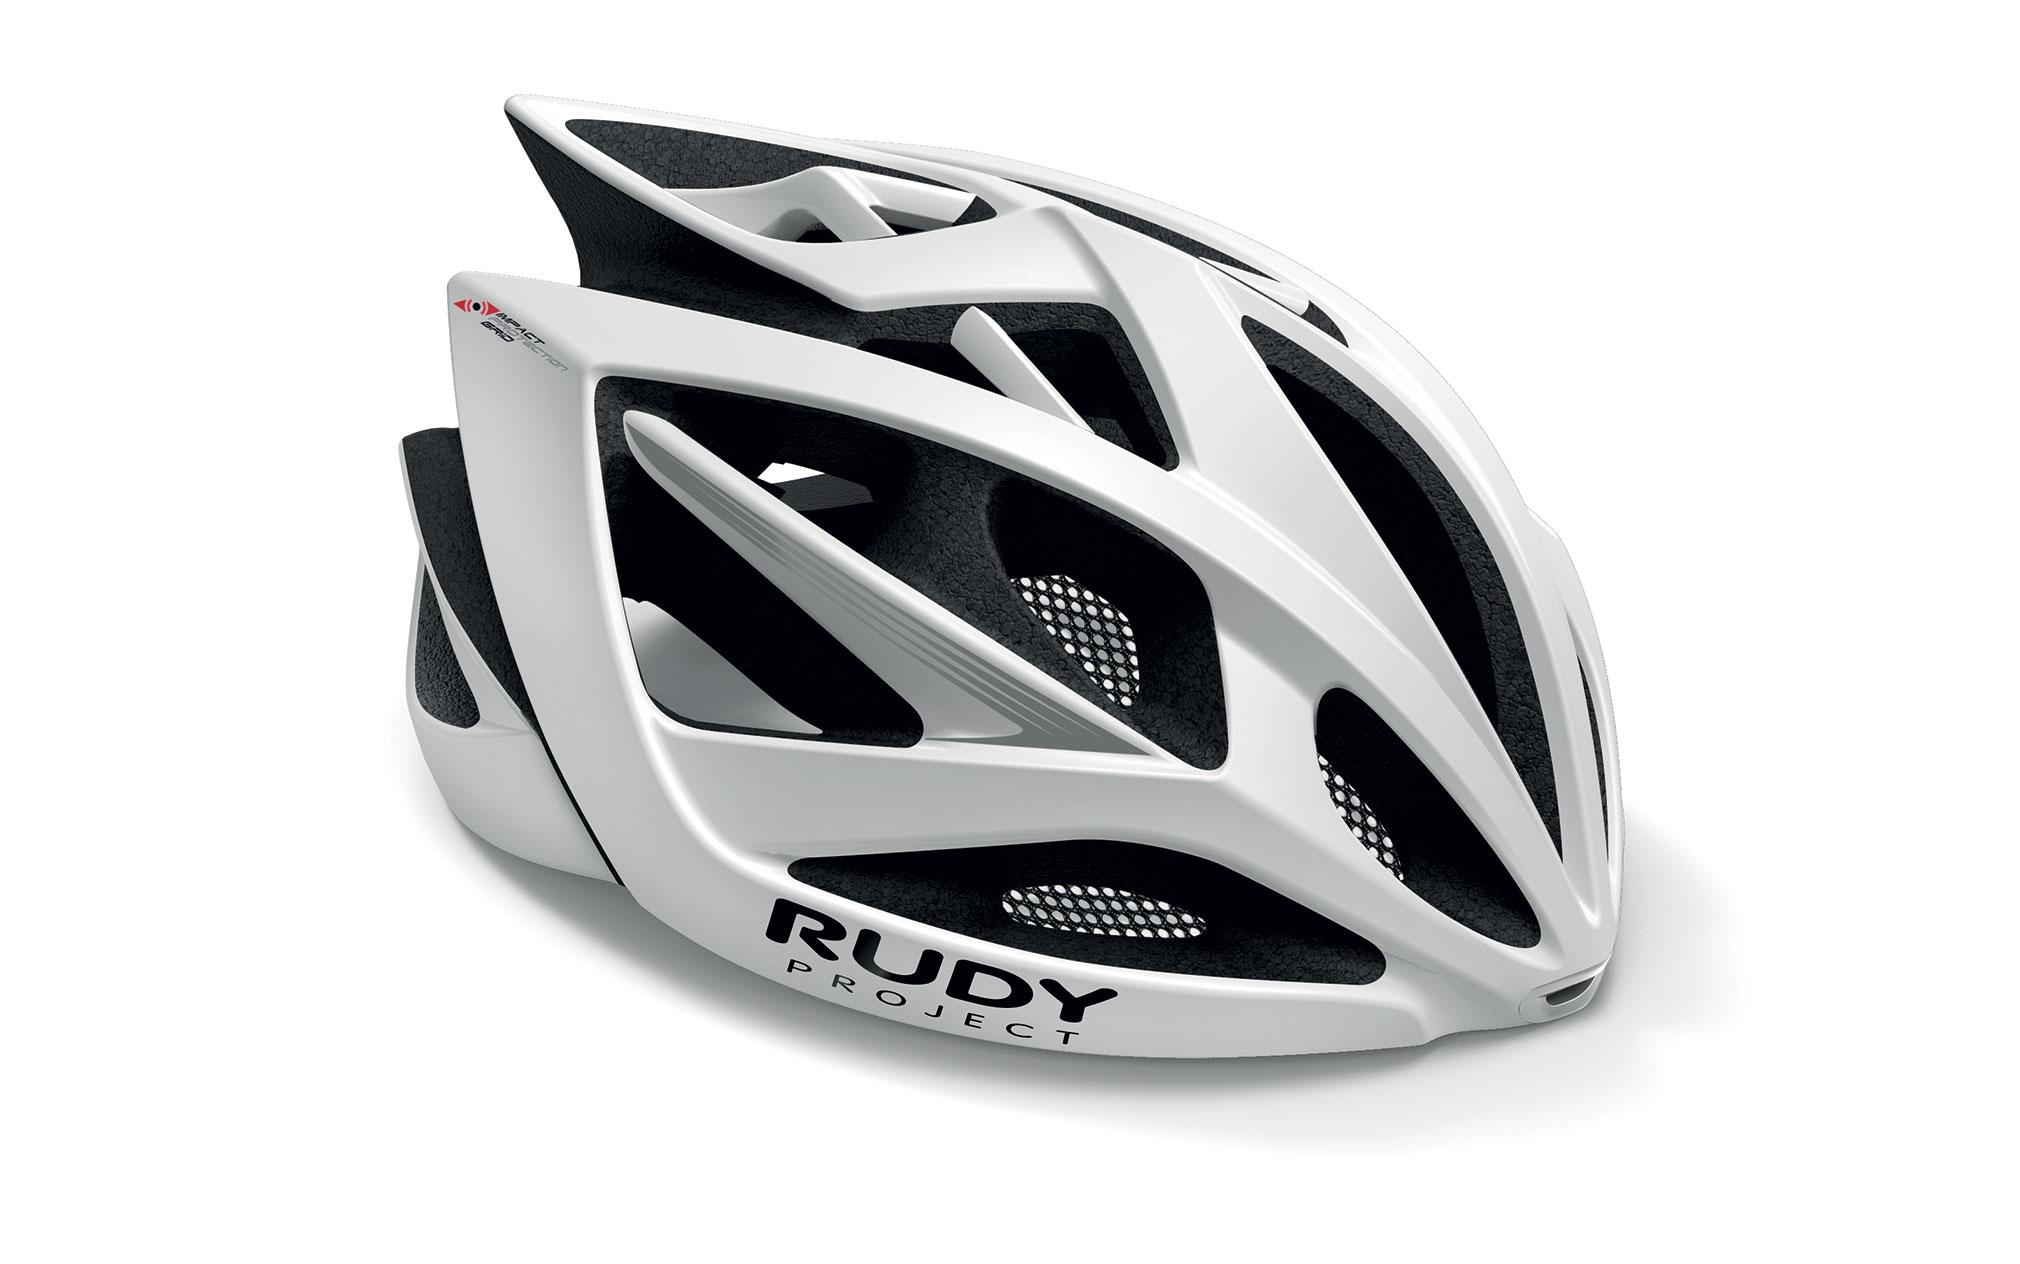 f04ddd8eb200 Helmets Airstorm - Rudy Project